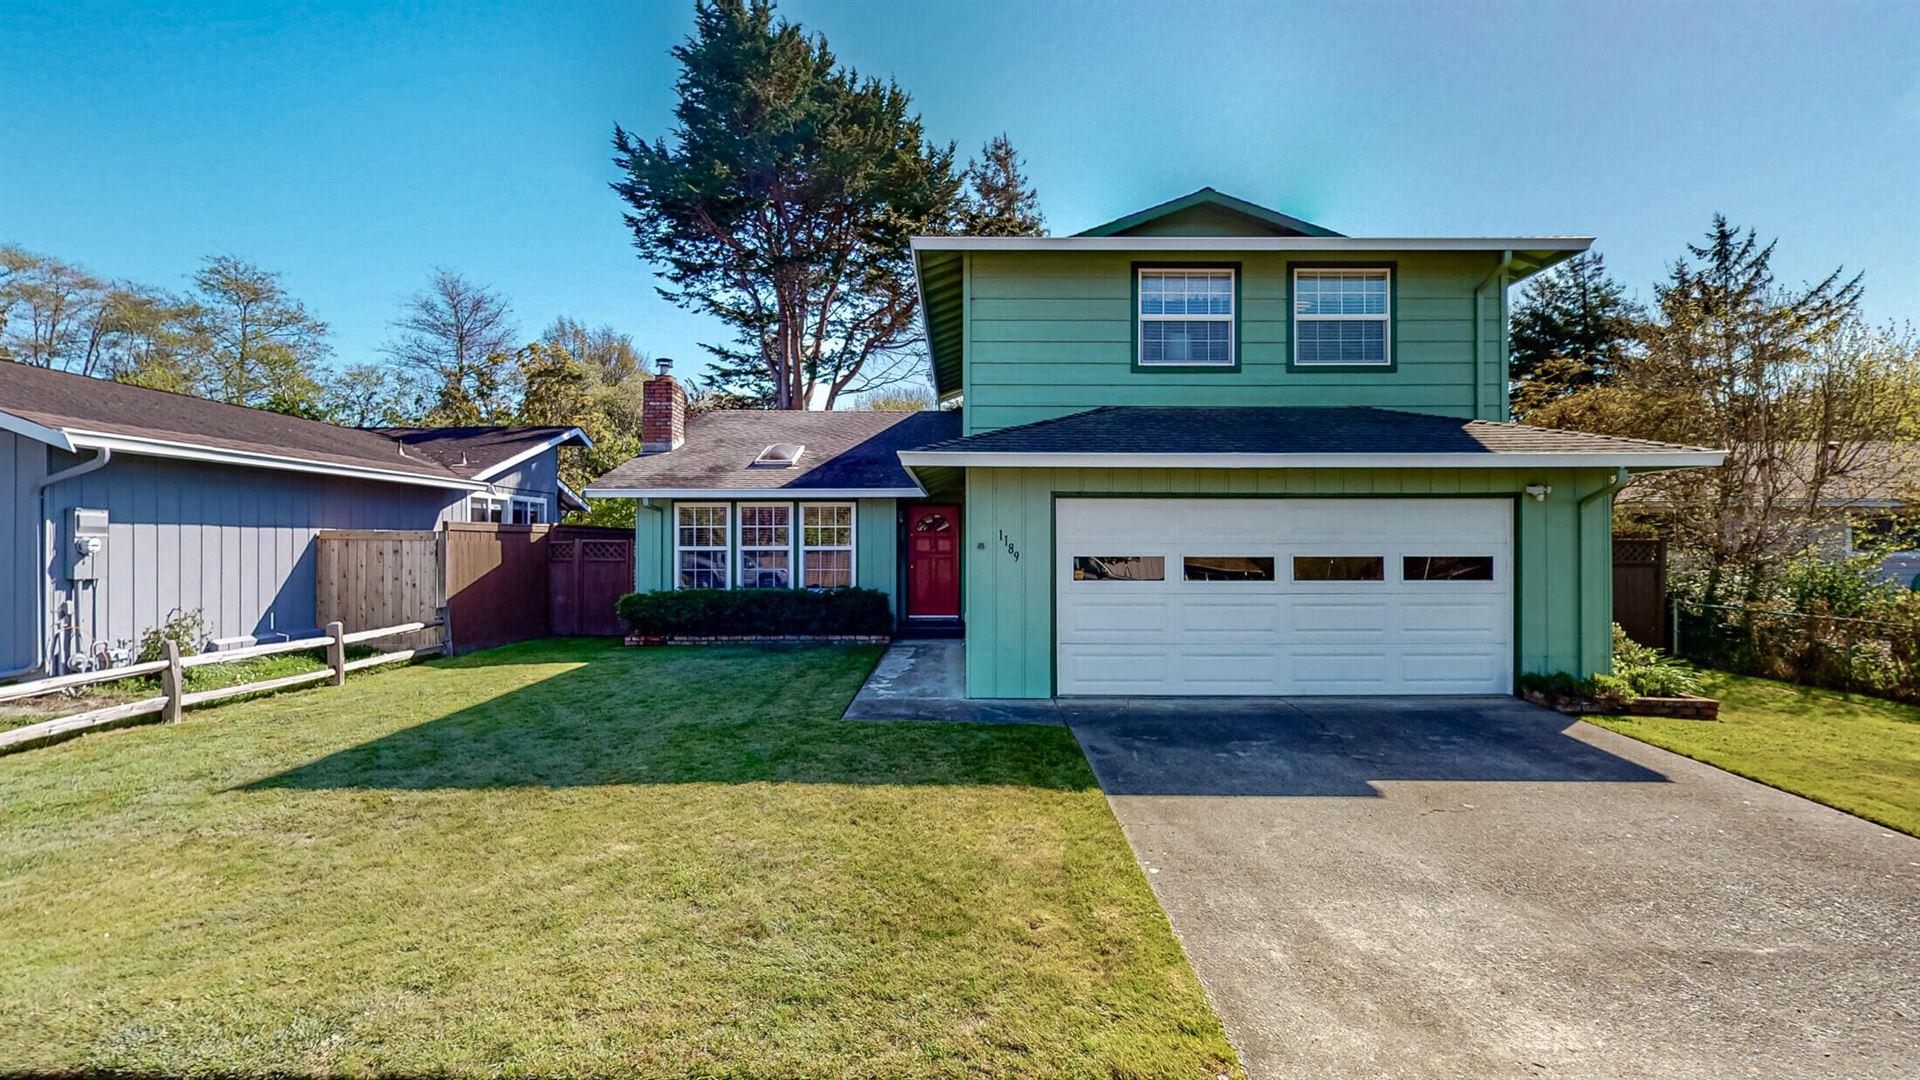 1189 Stromberg Avenue, Arcata, CA 95521 - MLS#: 258812